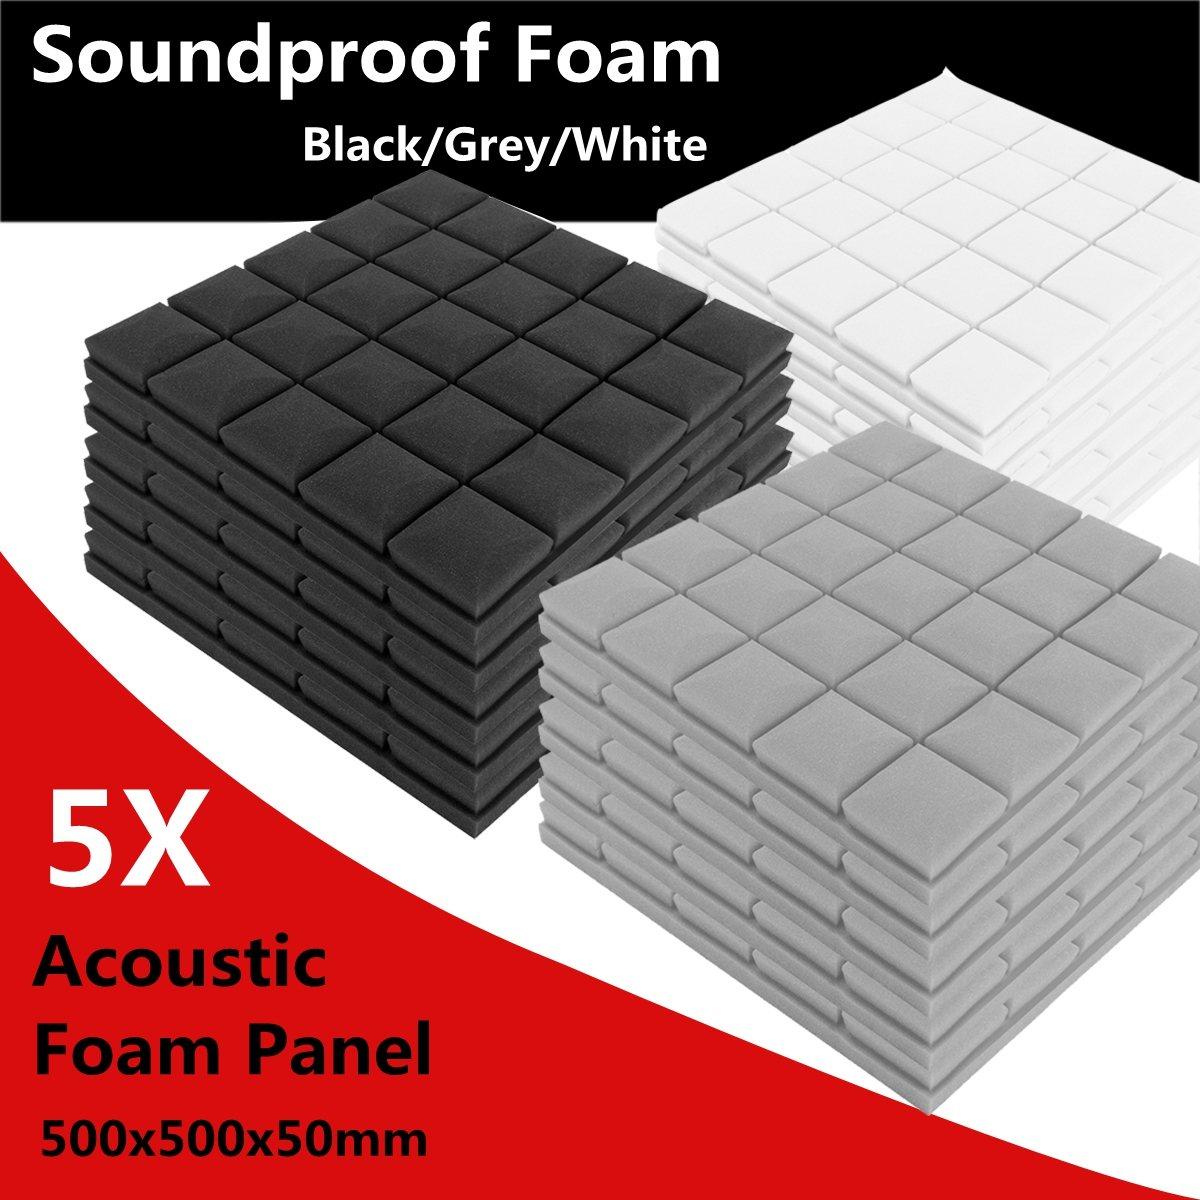 SENRHY 5Pcs 500x500x50mm Soundproof Foam Acoustic Sound Stop Absorption Sponge Drum Room Accessories sound absorption coefficient analysis